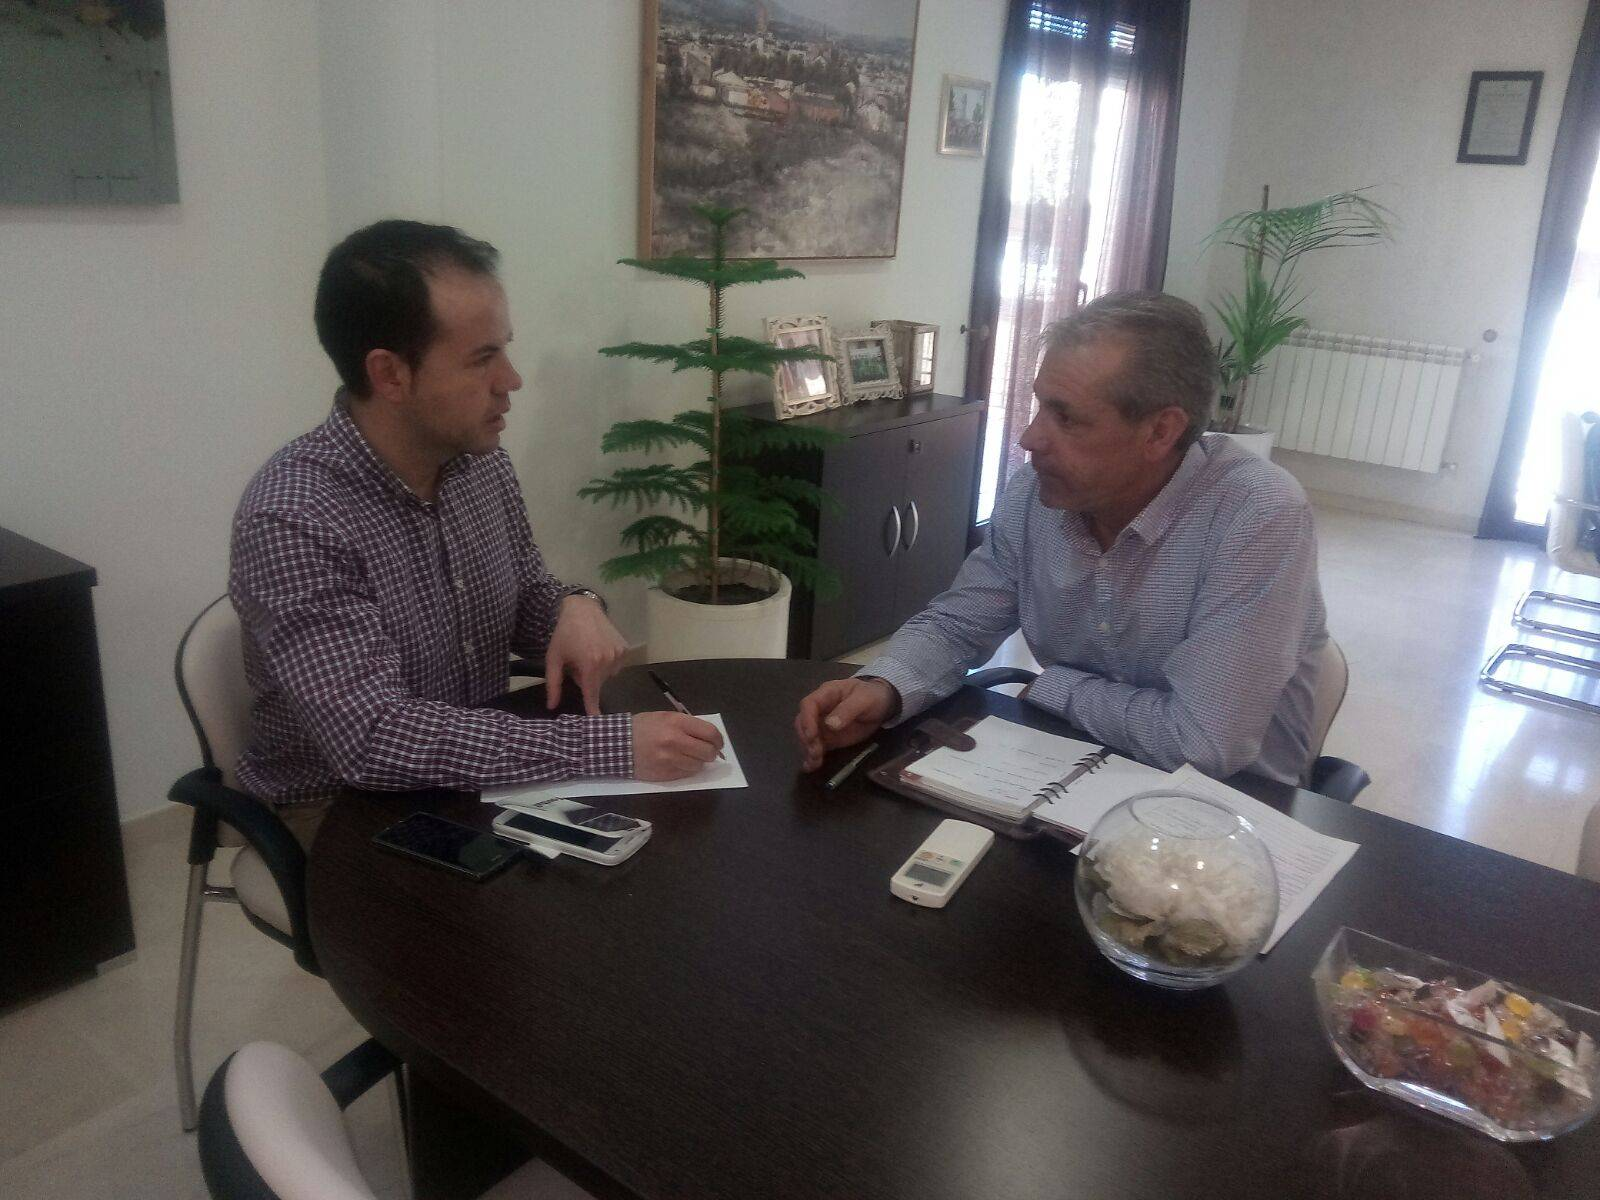 reunion ayuntamiento junta hermandades 2018 - Reunión del Ayuntamiento con la Junta de Hermandades por Semana Santa 2018